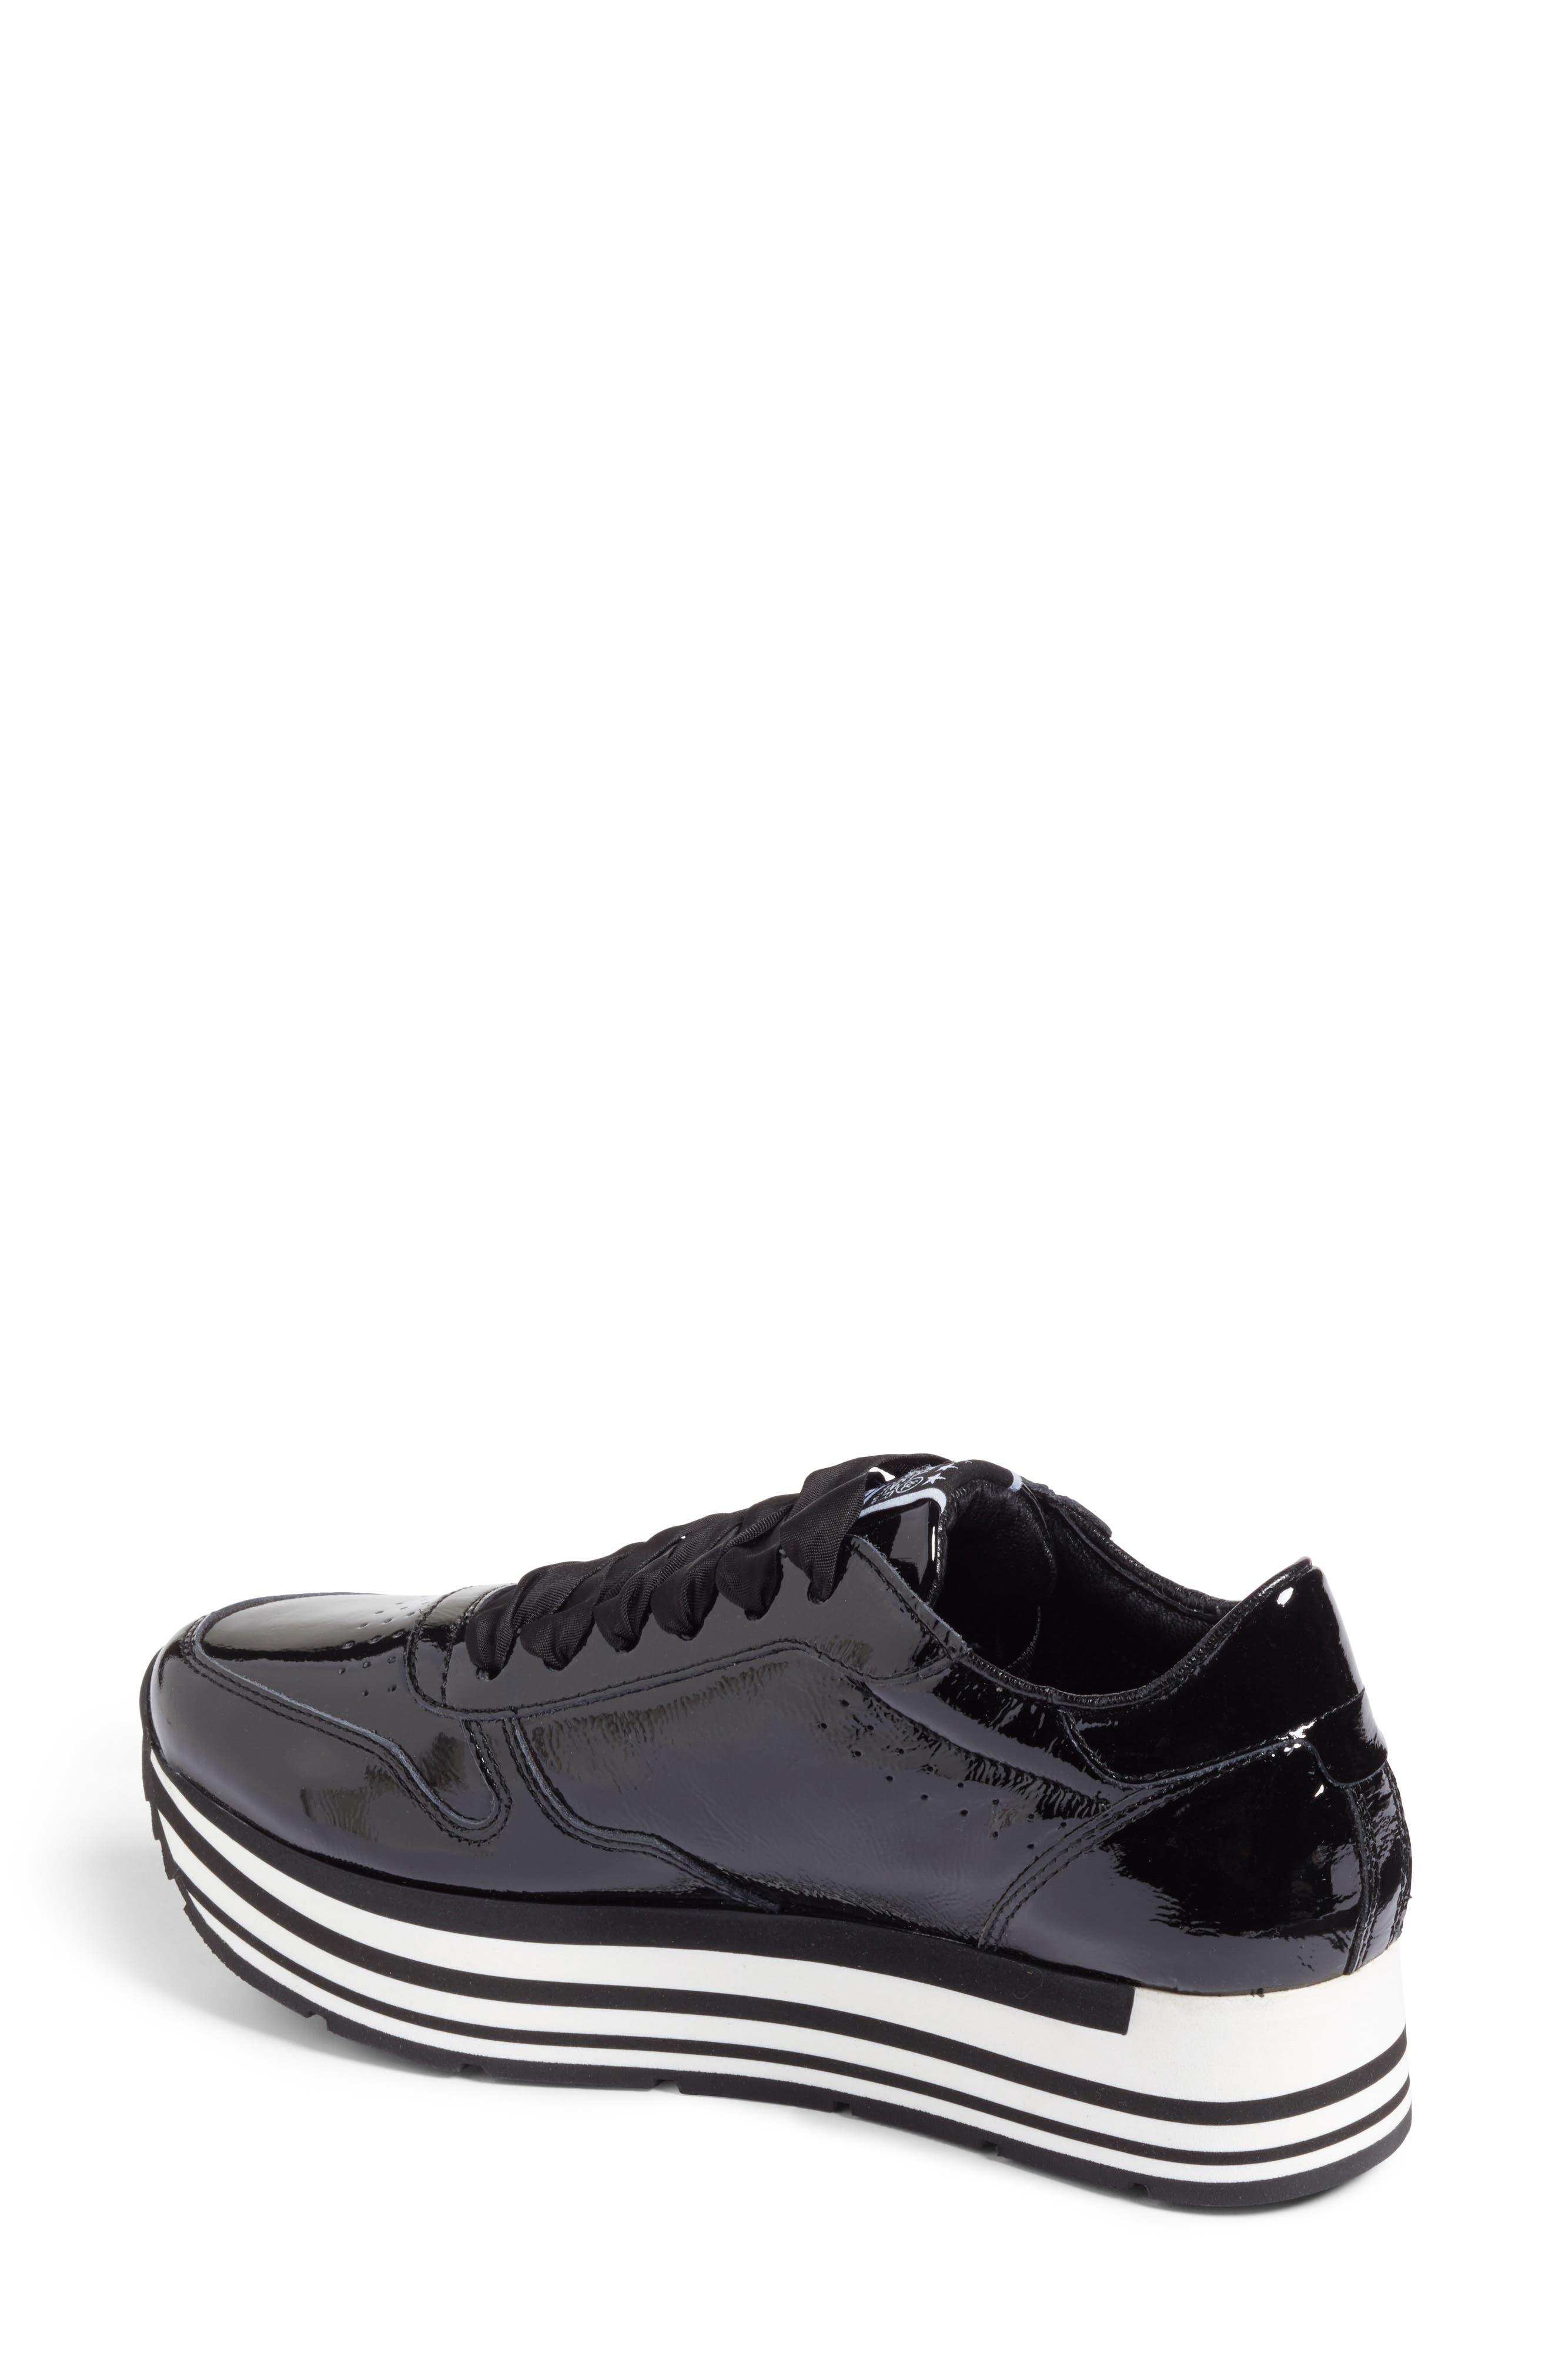 Kennel & Schmenger Nova Patent Leather Sneaker,                             Alternate thumbnail 2, color,                             Black